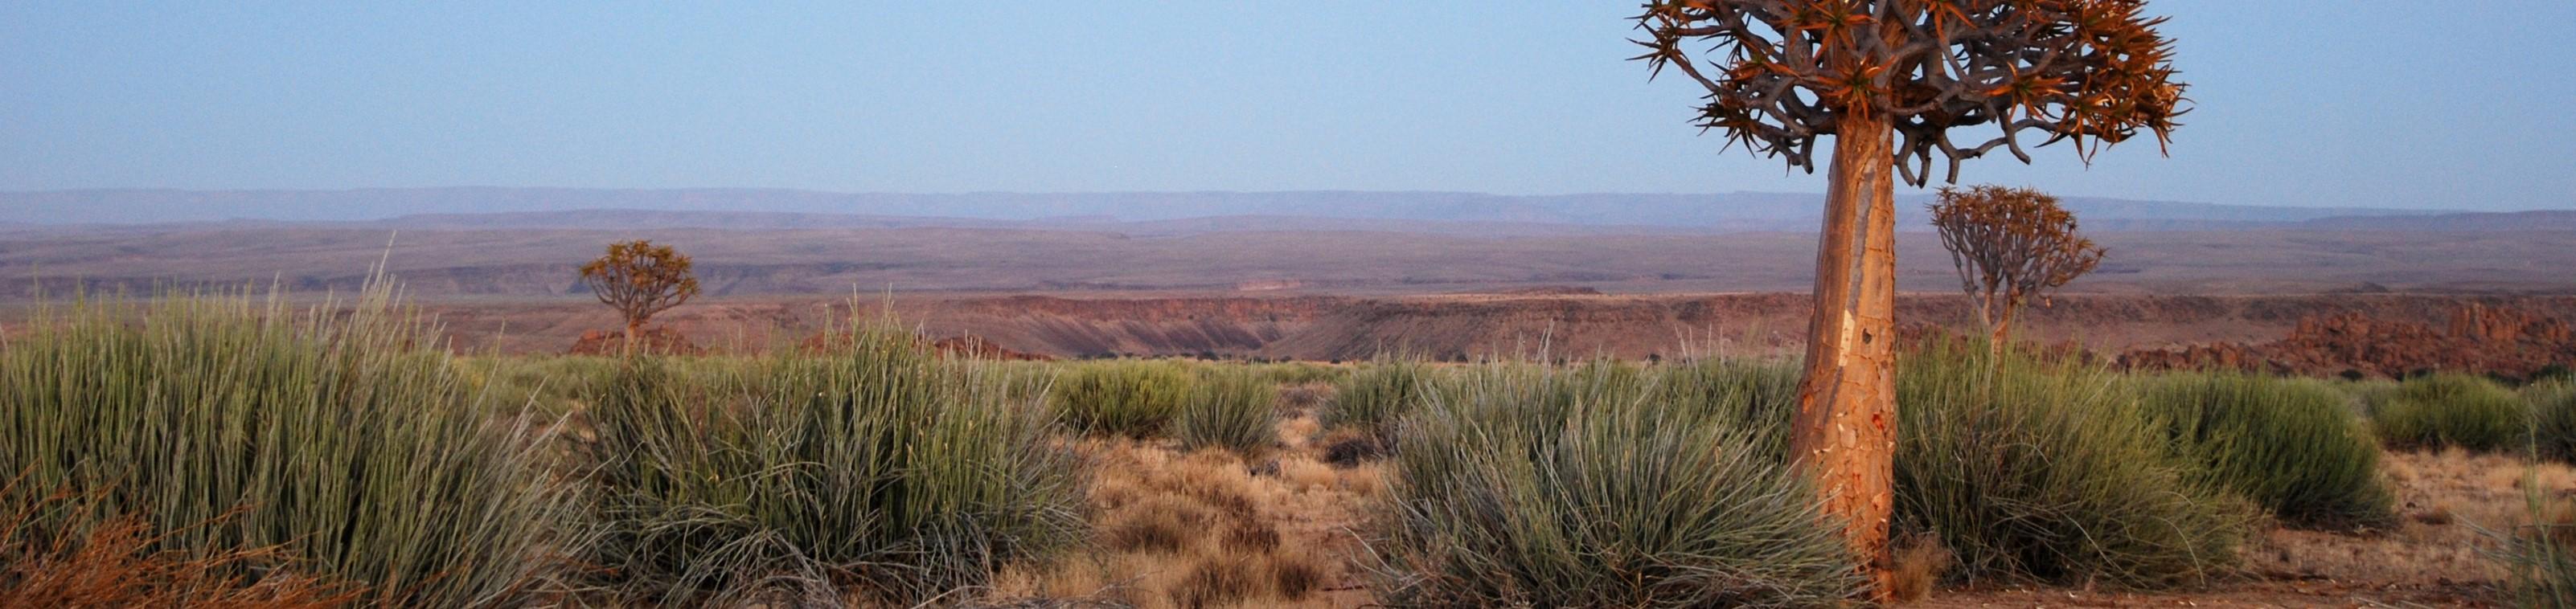 Rondreis klassiekers van Namibië